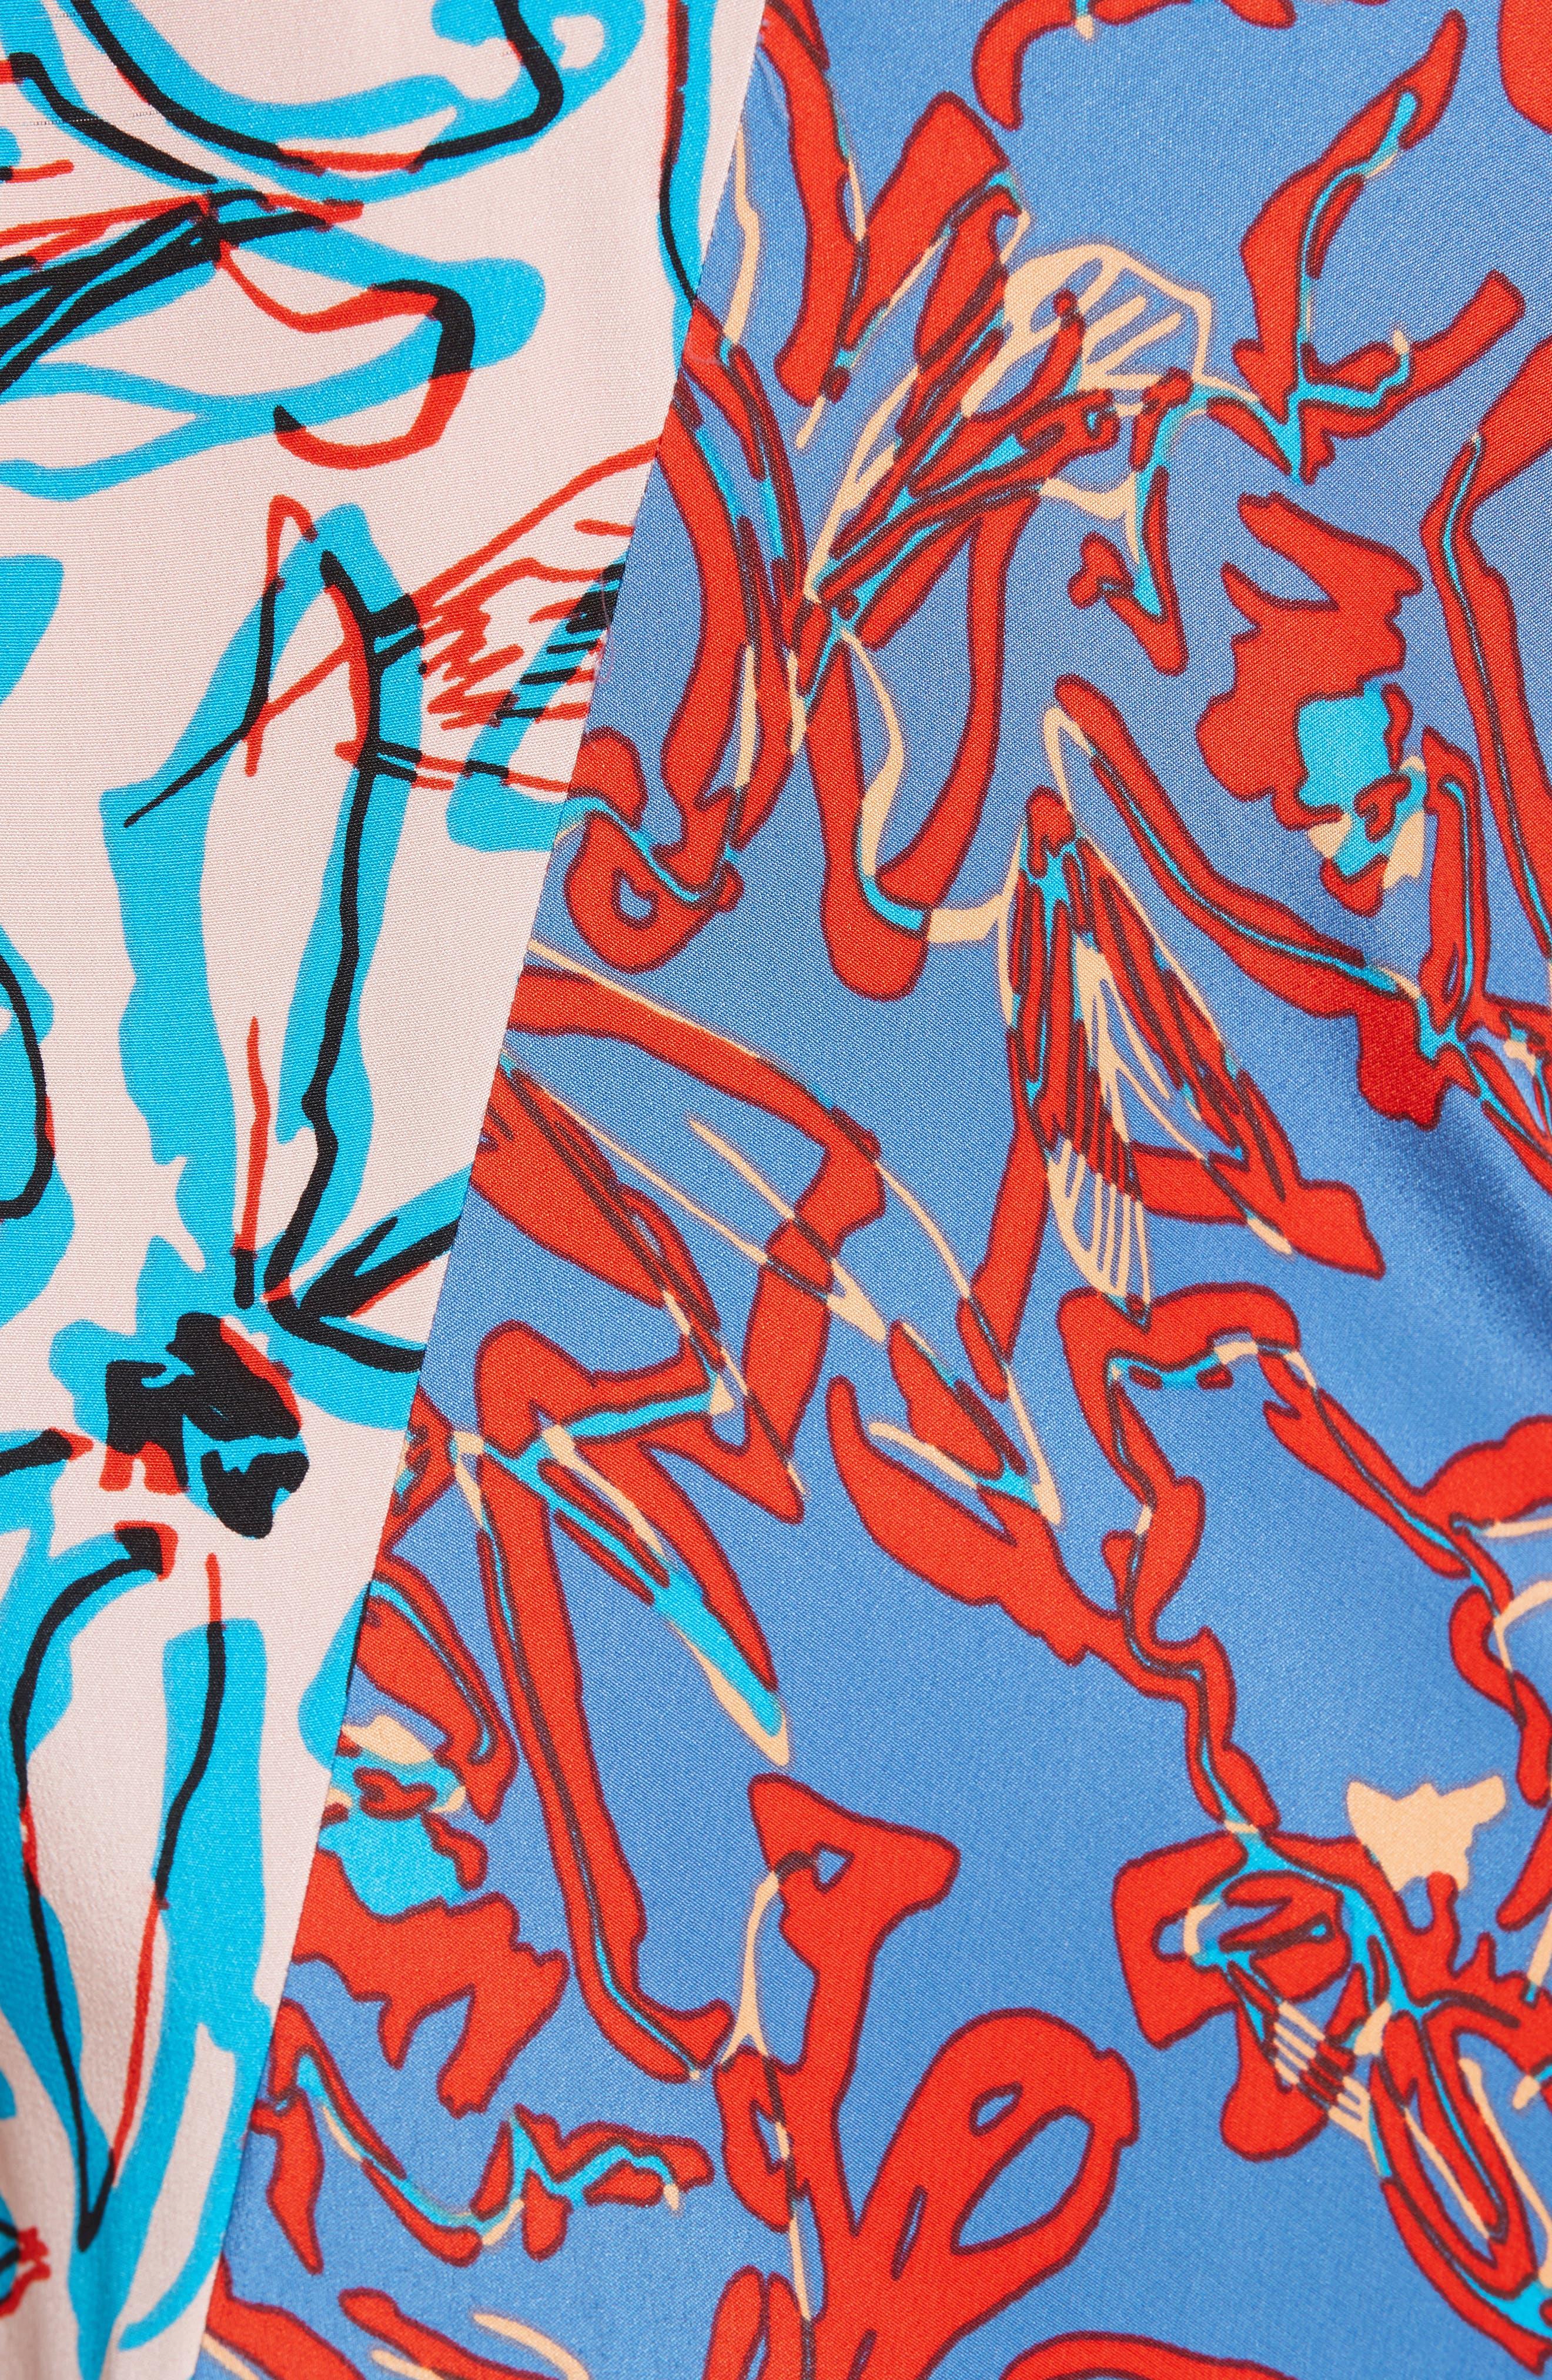 Asymmetrical Mixed Print Silk Maxi Dress,                             Alternate thumbnail 5, color,                             100